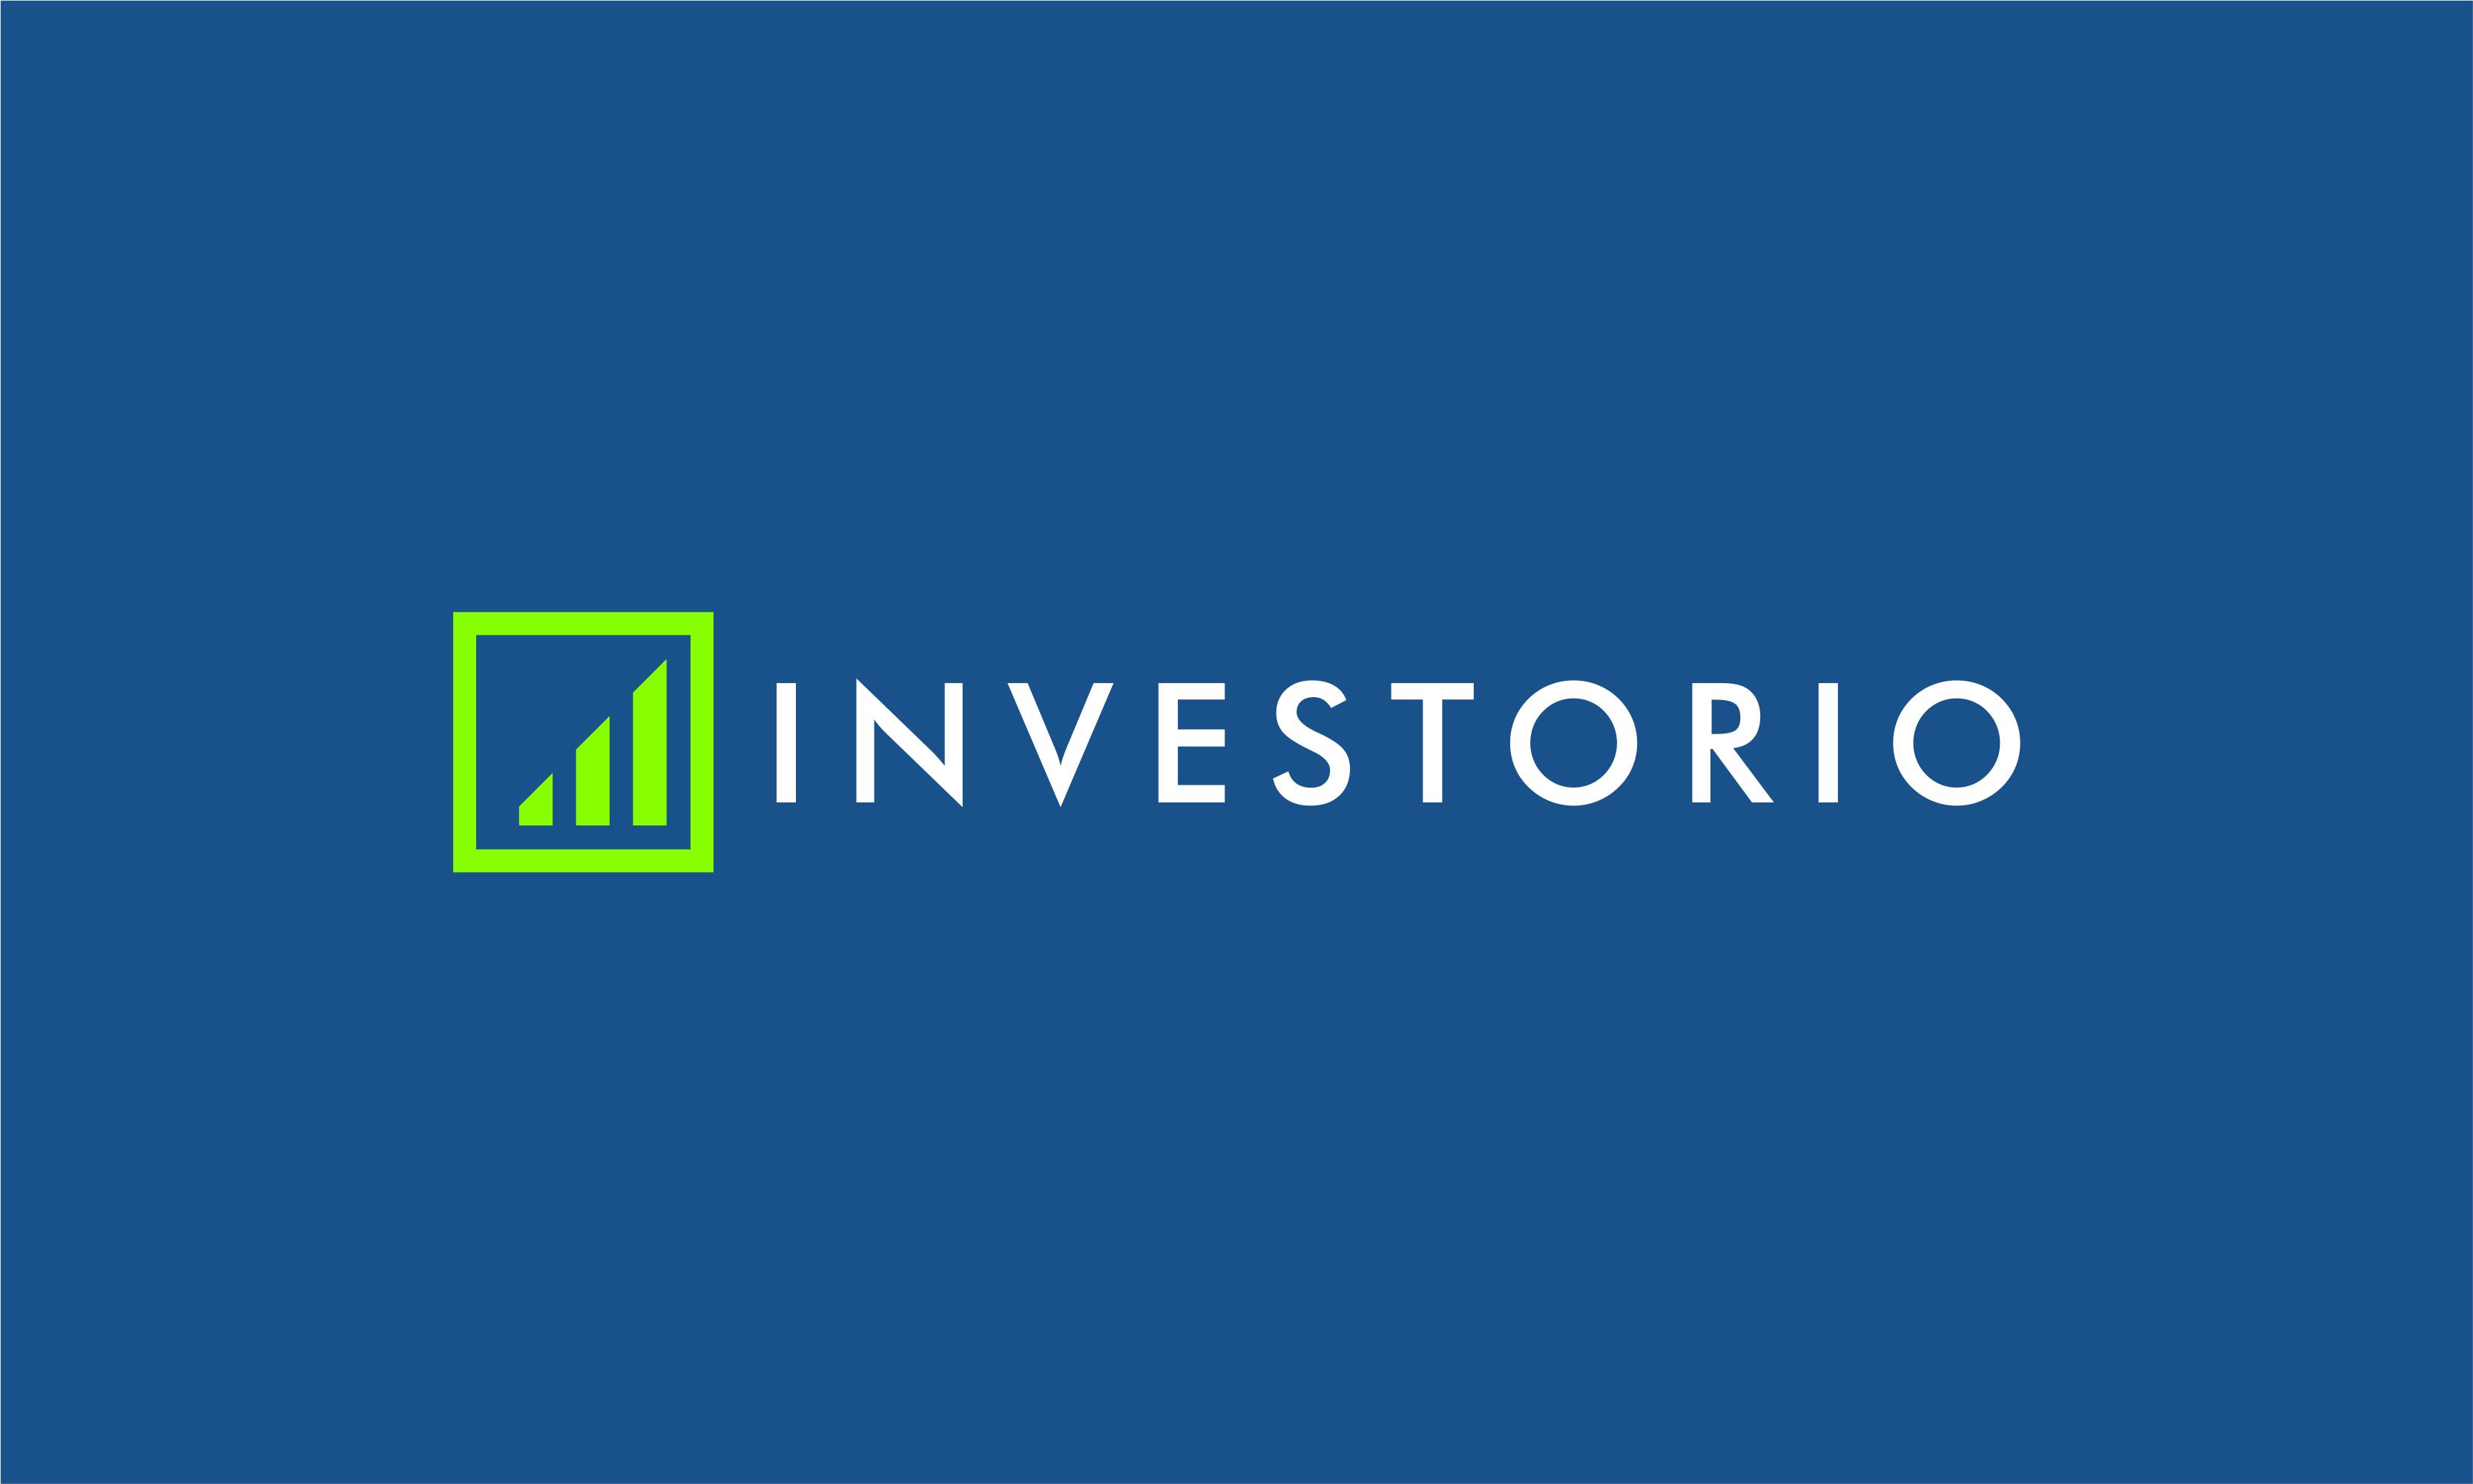 Investorio